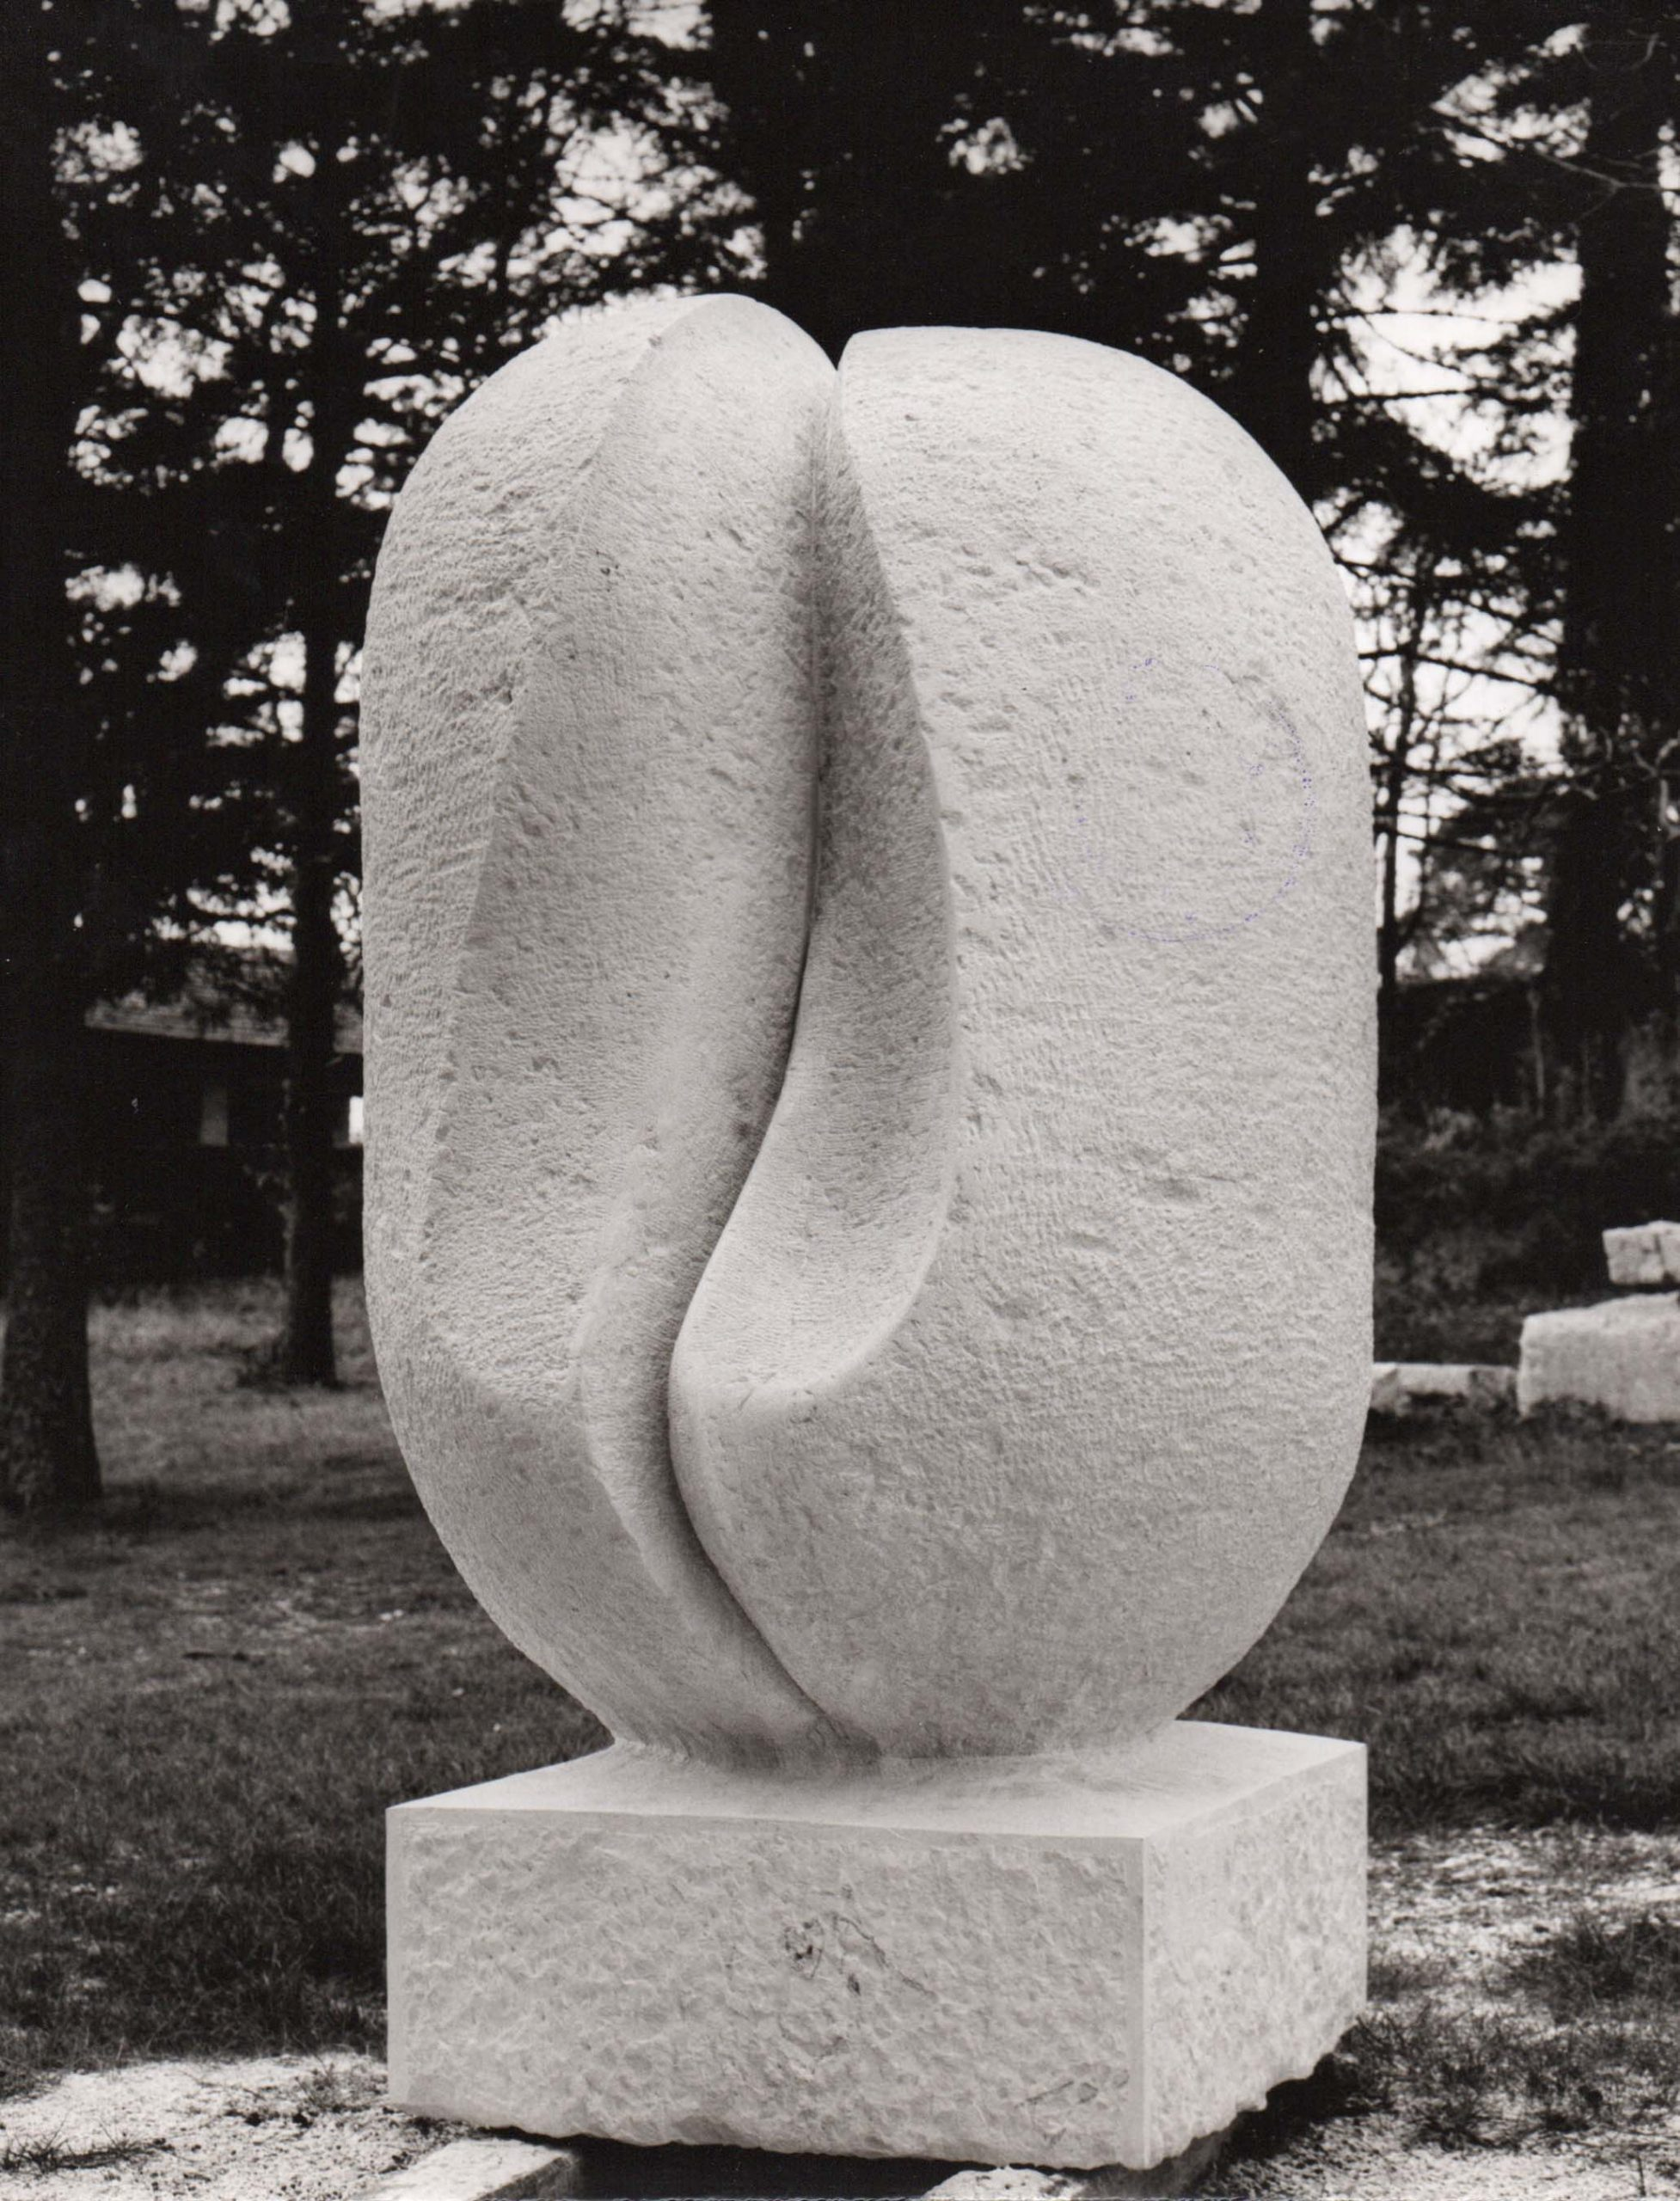 Ana Bešlić, Frutto, 1975